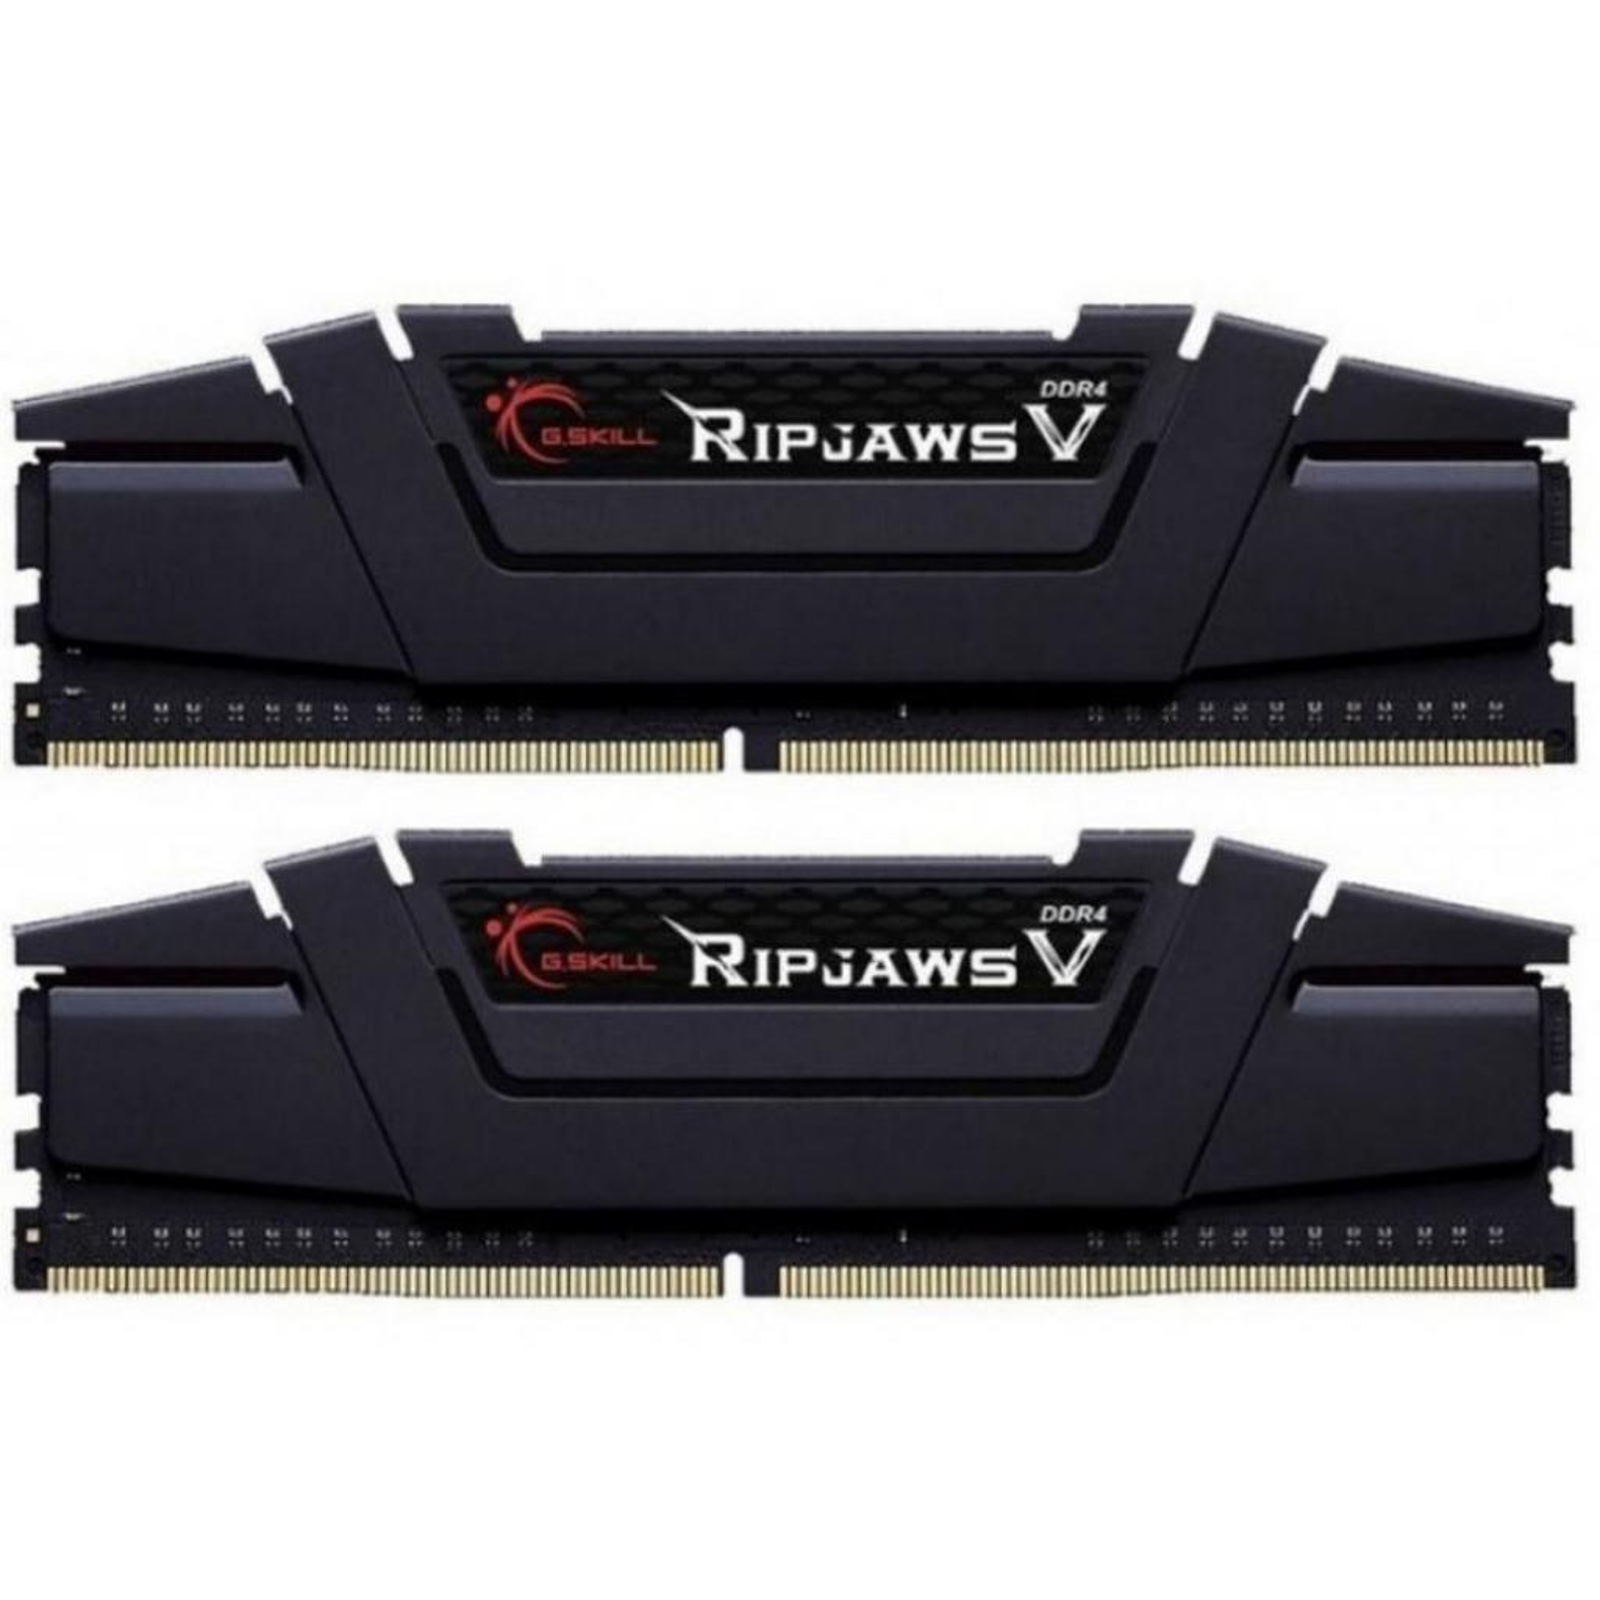 Модуль памяти для компьютера DDR4 16GB (2x8GB) 3200 MHz RipjawsV G.Skill (F4-3200C14D-16GVK)